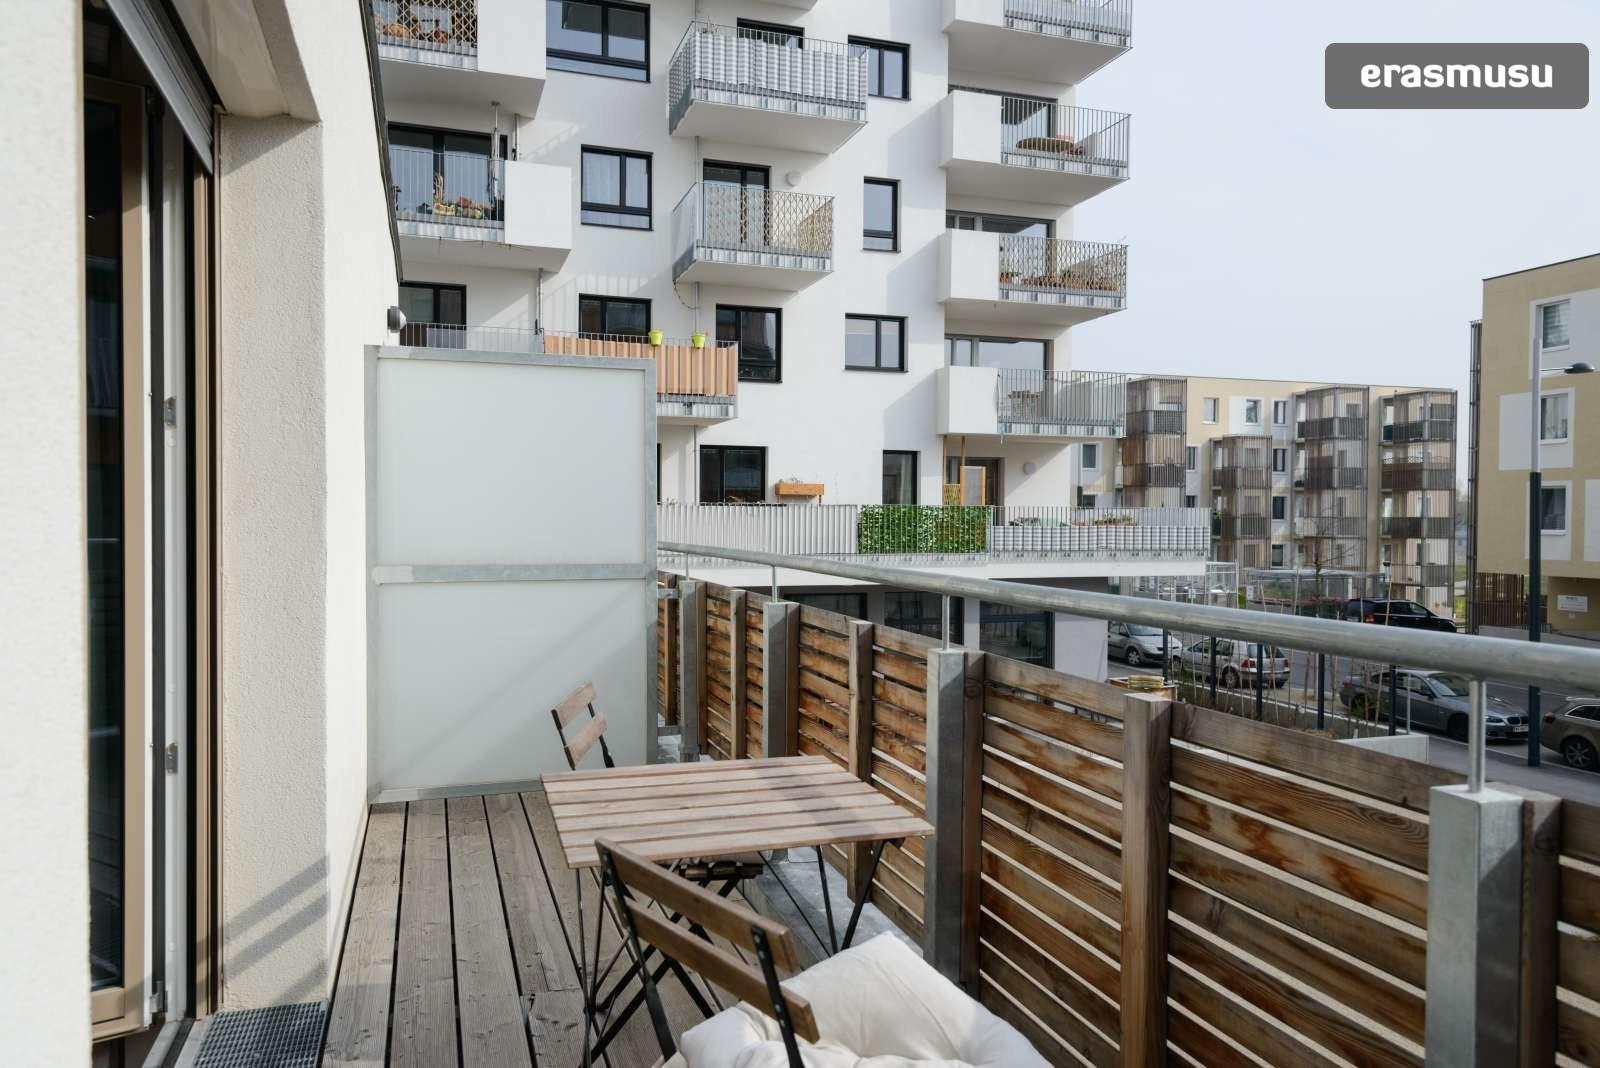 spacious-studio-apartment-rent-aspern-area-donaustadt-ee2d630560